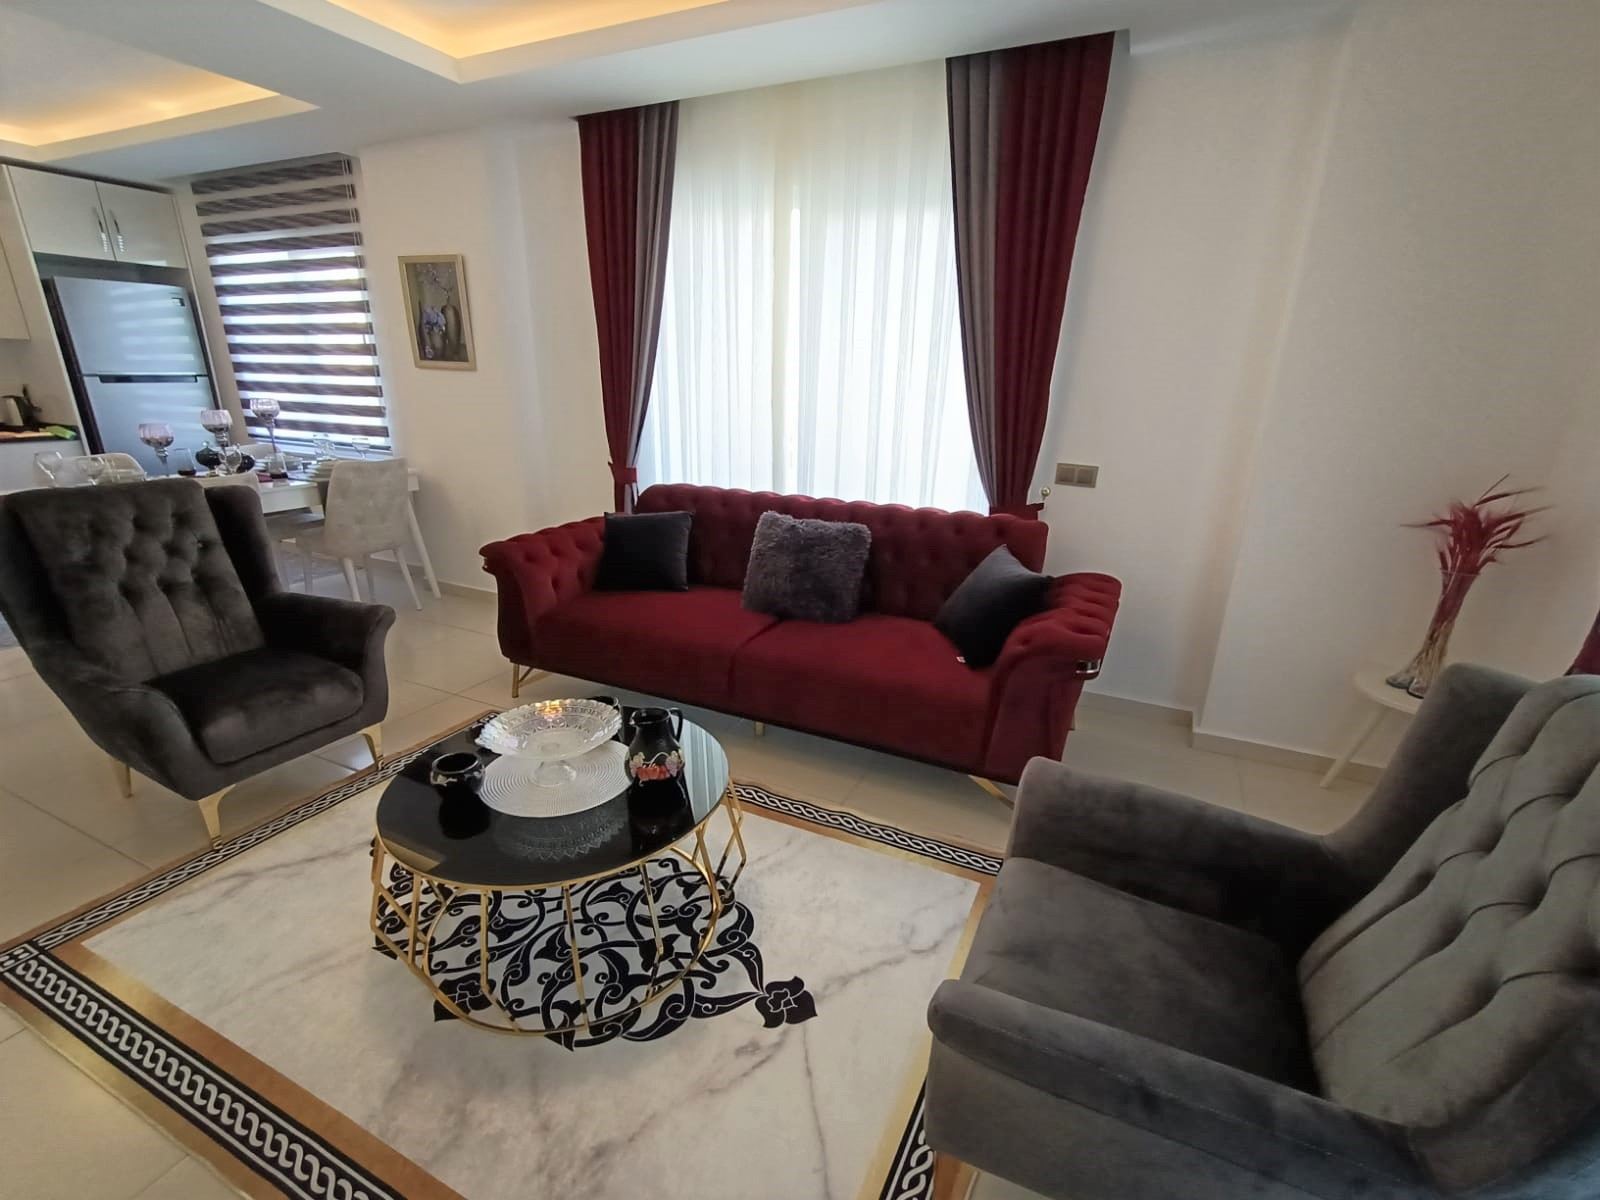 Двухкомнатная квартира с мебелью в районе Махмутлар - Фото 7